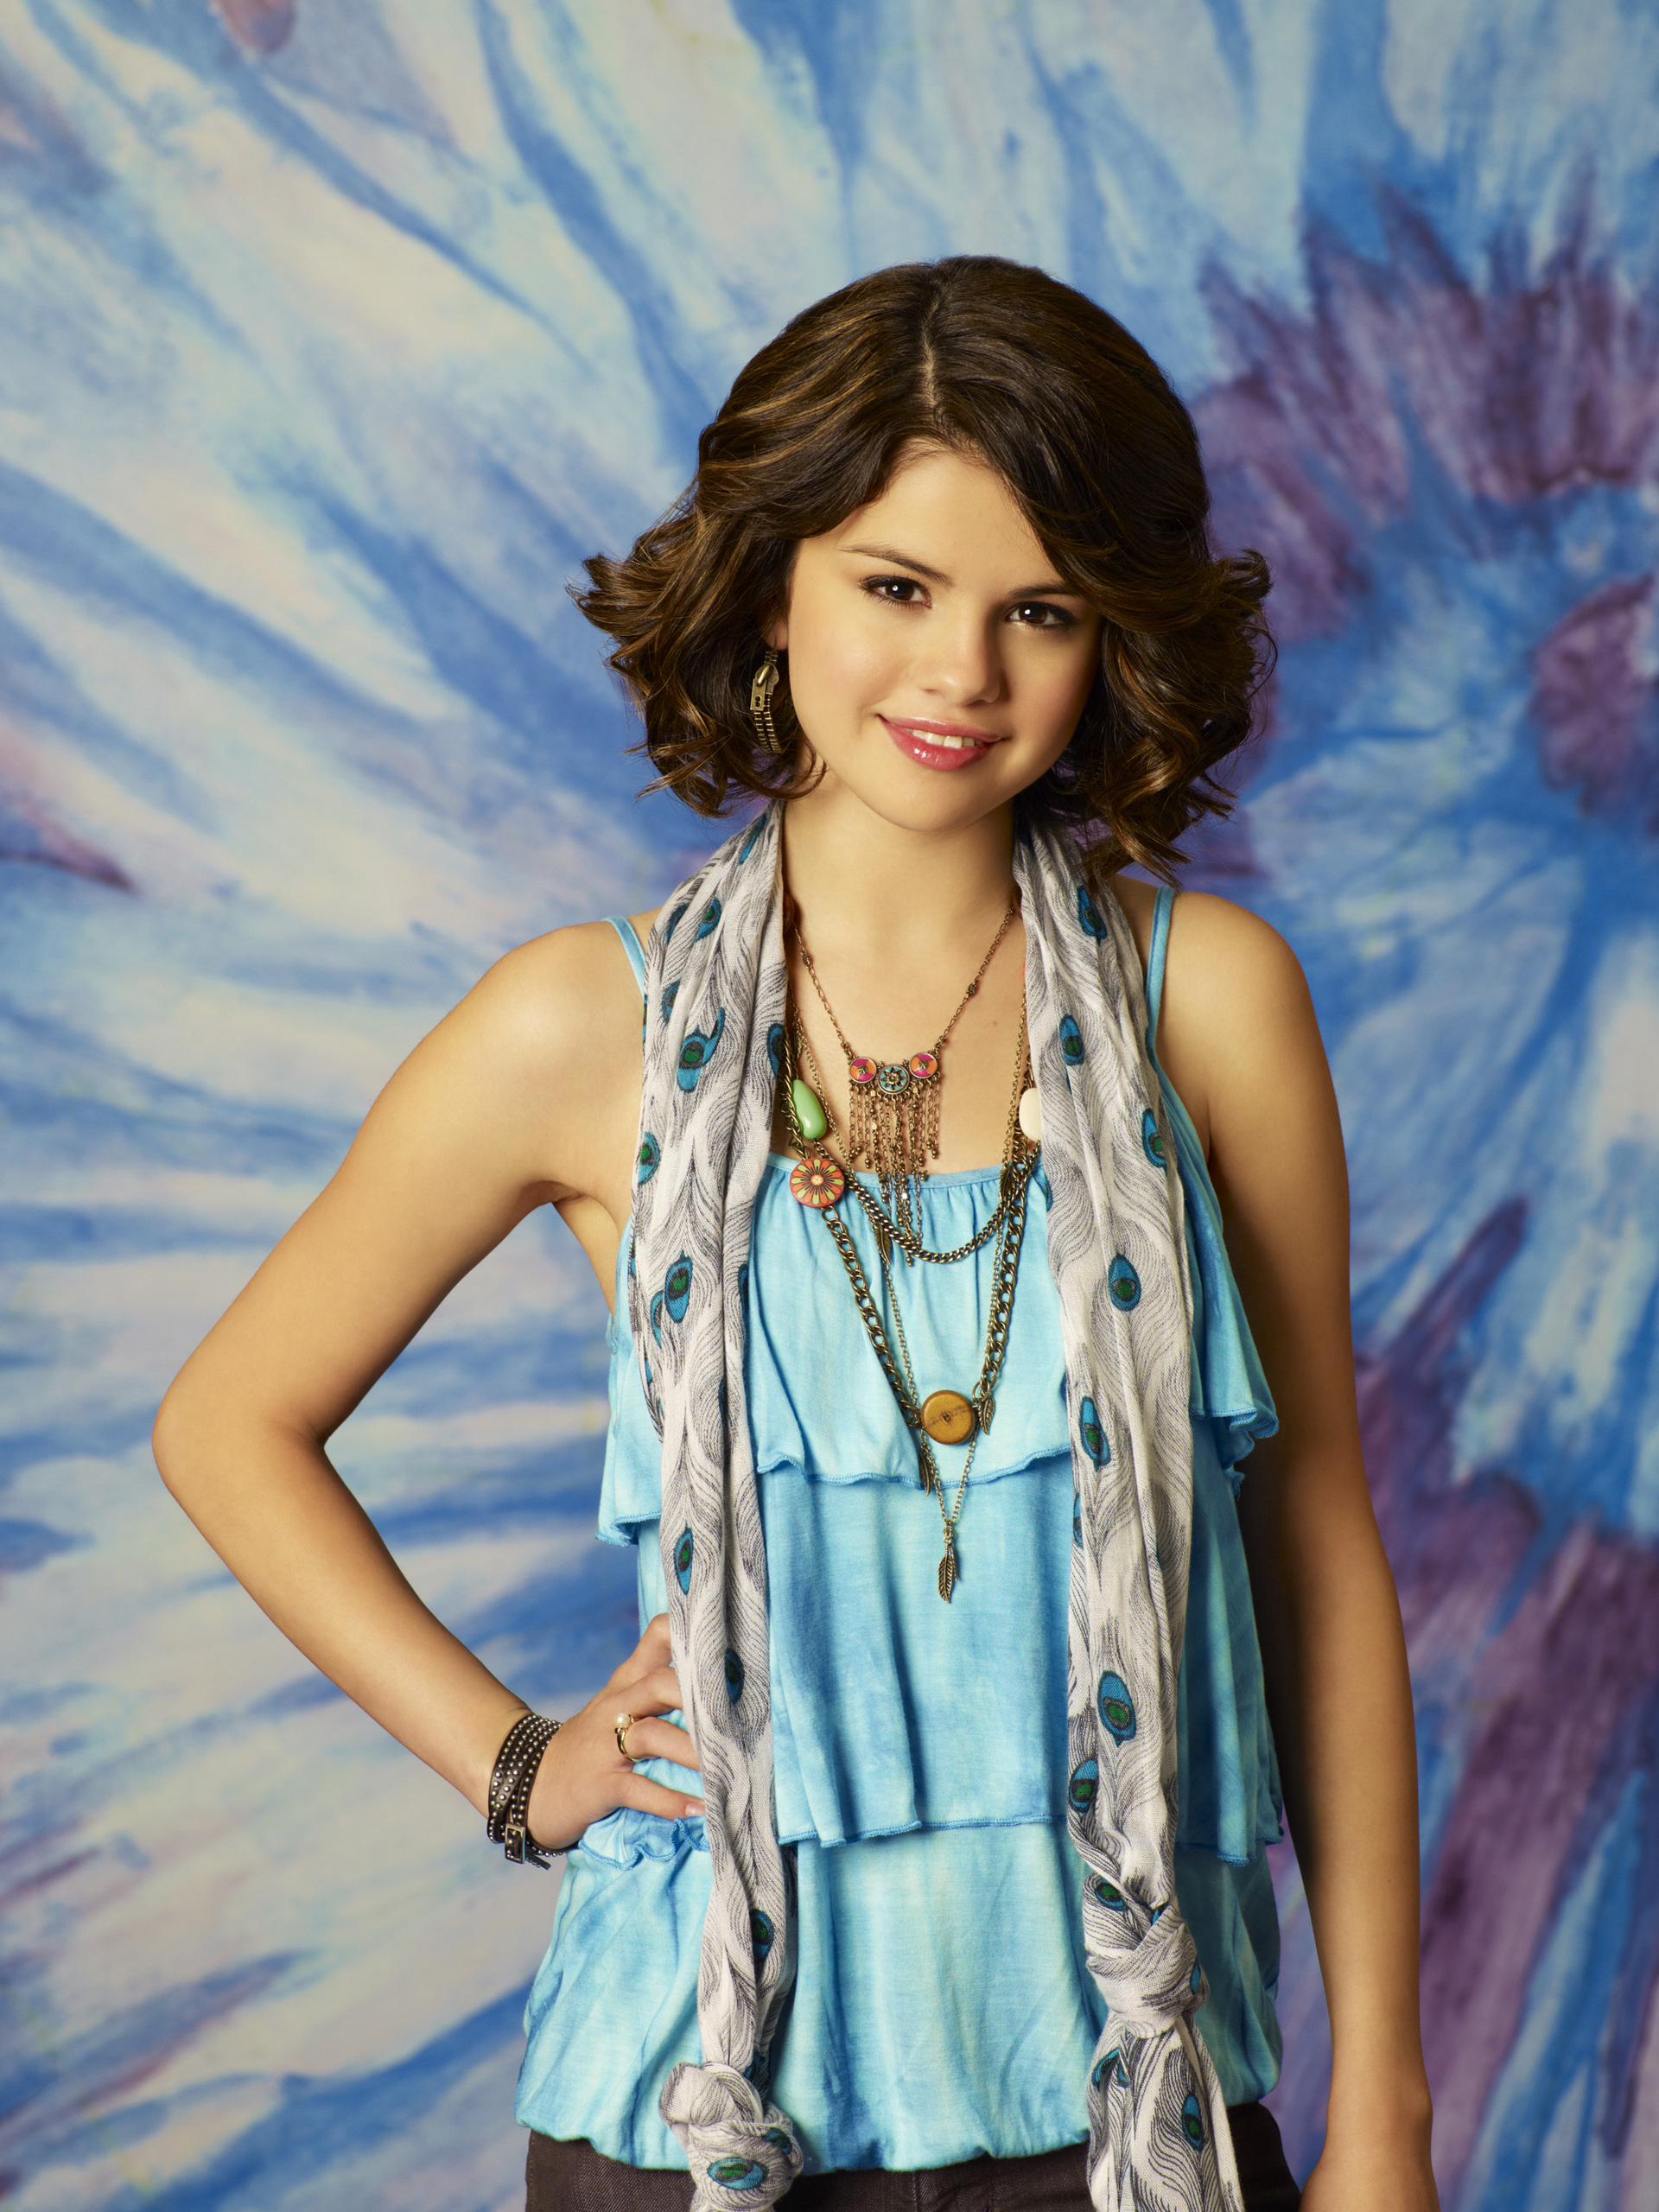 external image Selena-Gomez-Season-3-Wizards-Photoshoot-HQ-selena-gomez-8329114-1920-2560.jpg